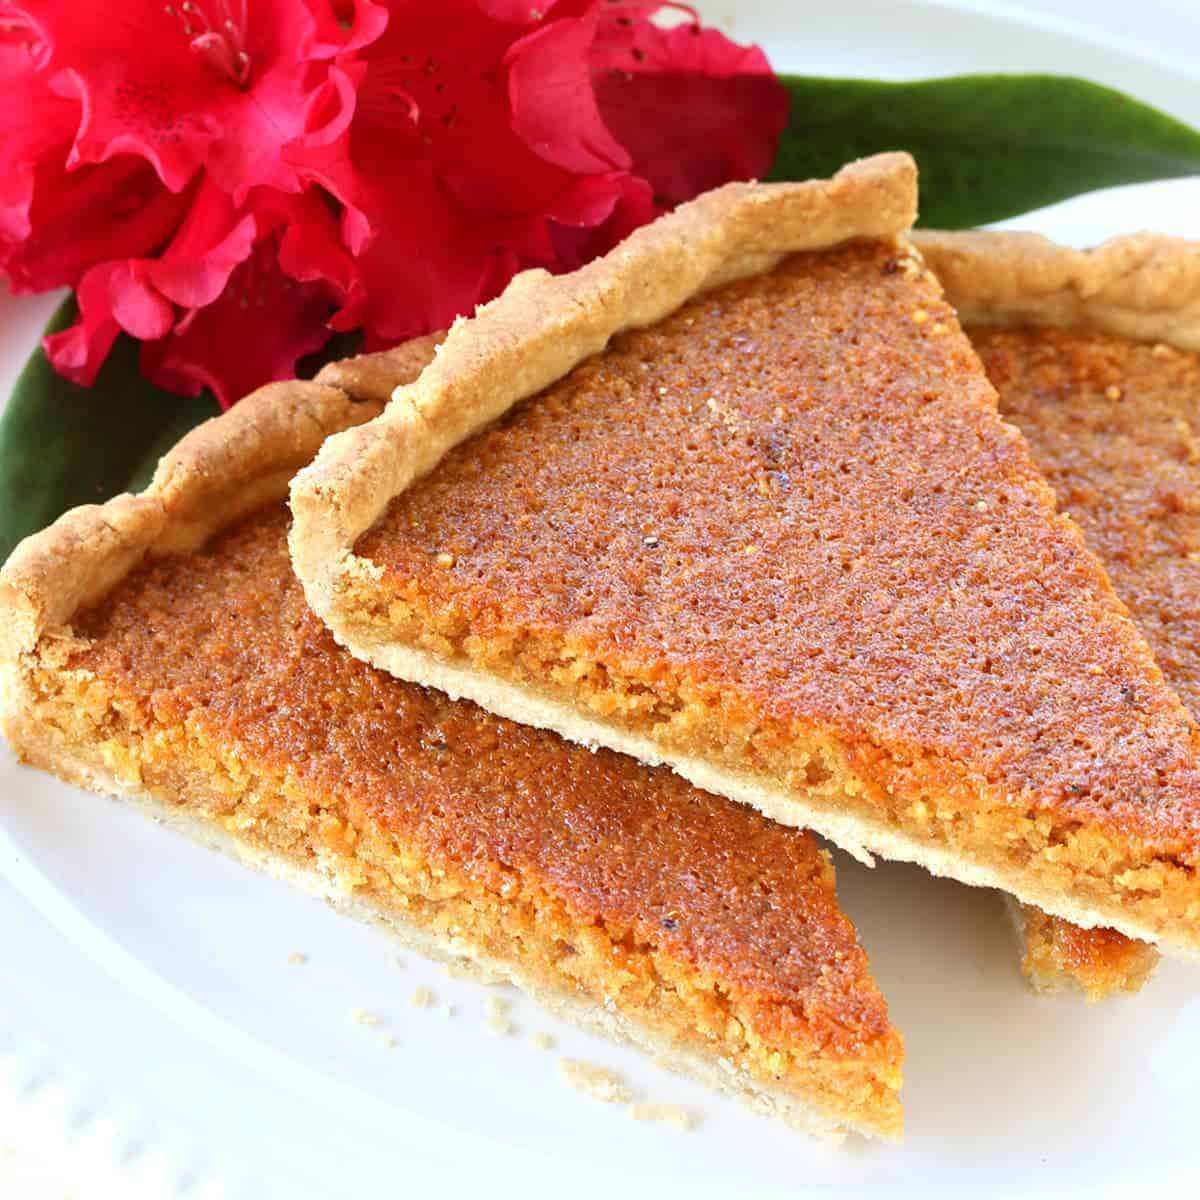 gluten free treacle tart recipe gf traditional British English golden syrup